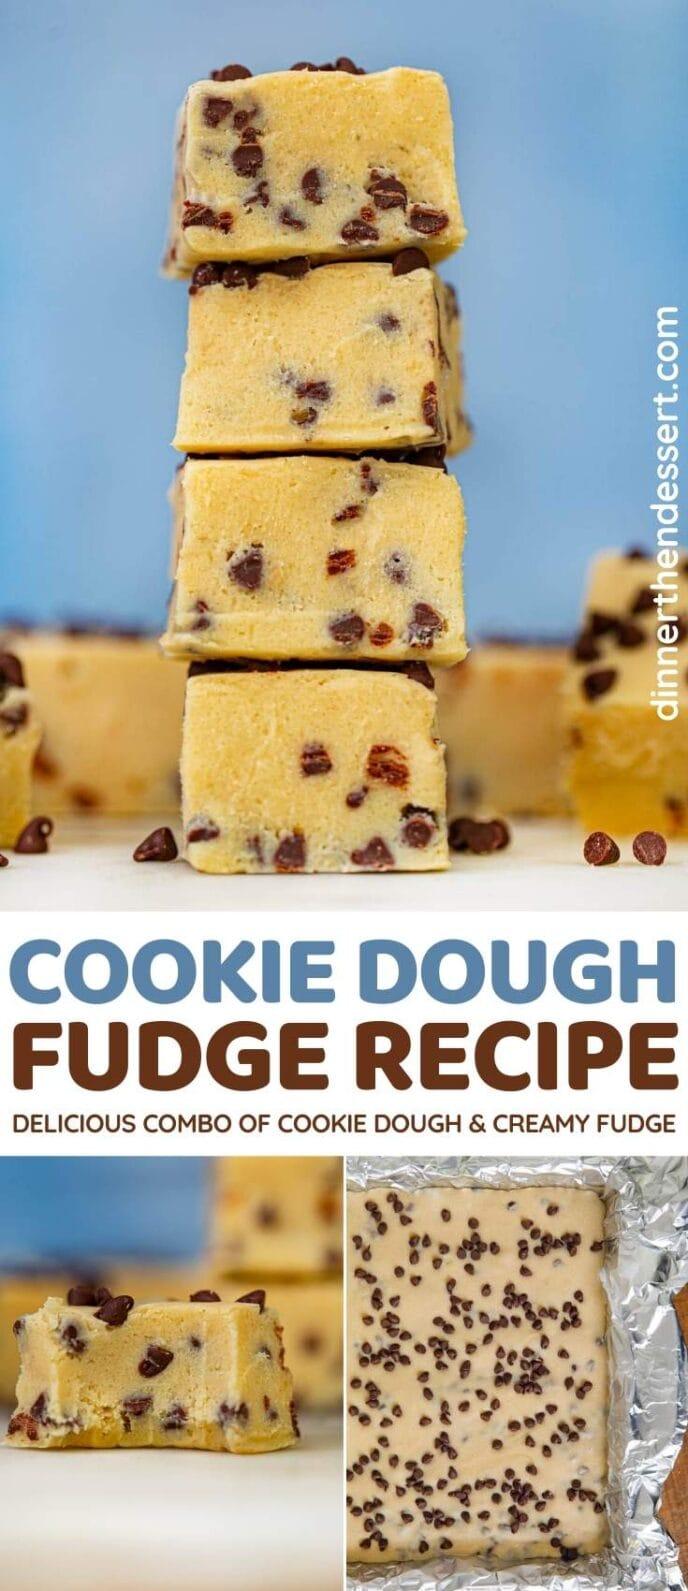 Cookie Dough Fudge collage